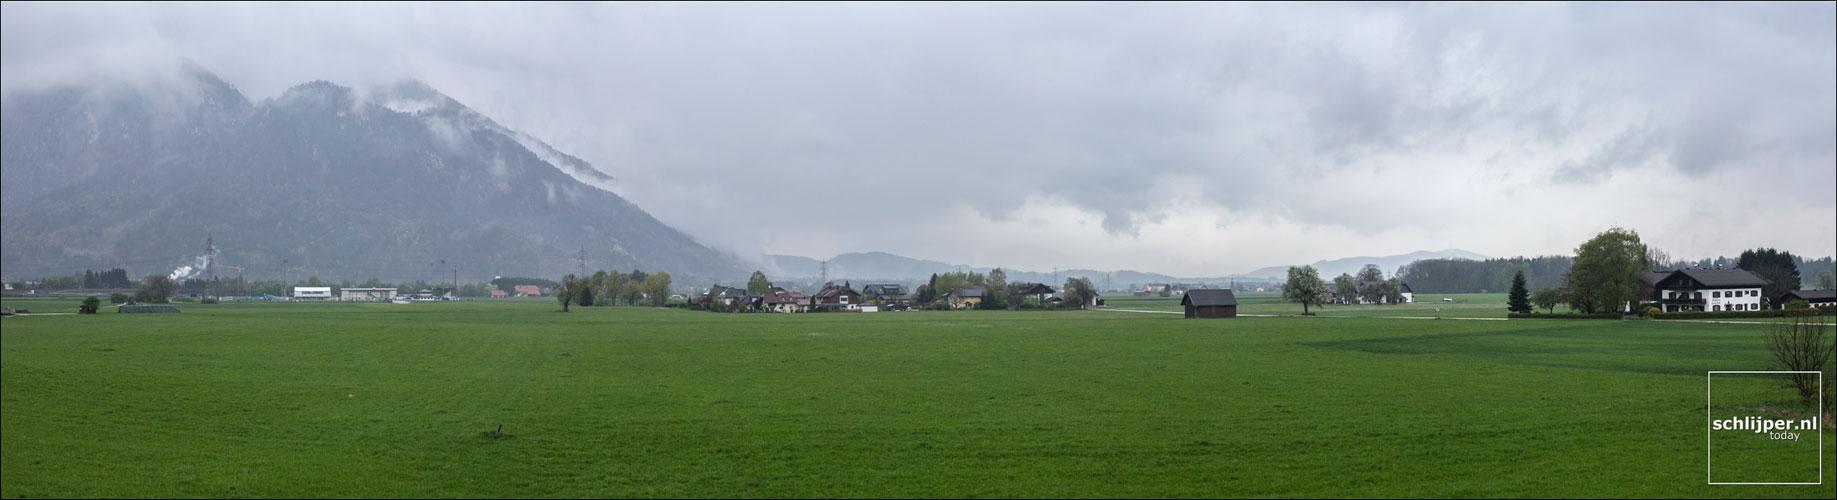 Oostenrijk, Anif, 10 april 2014